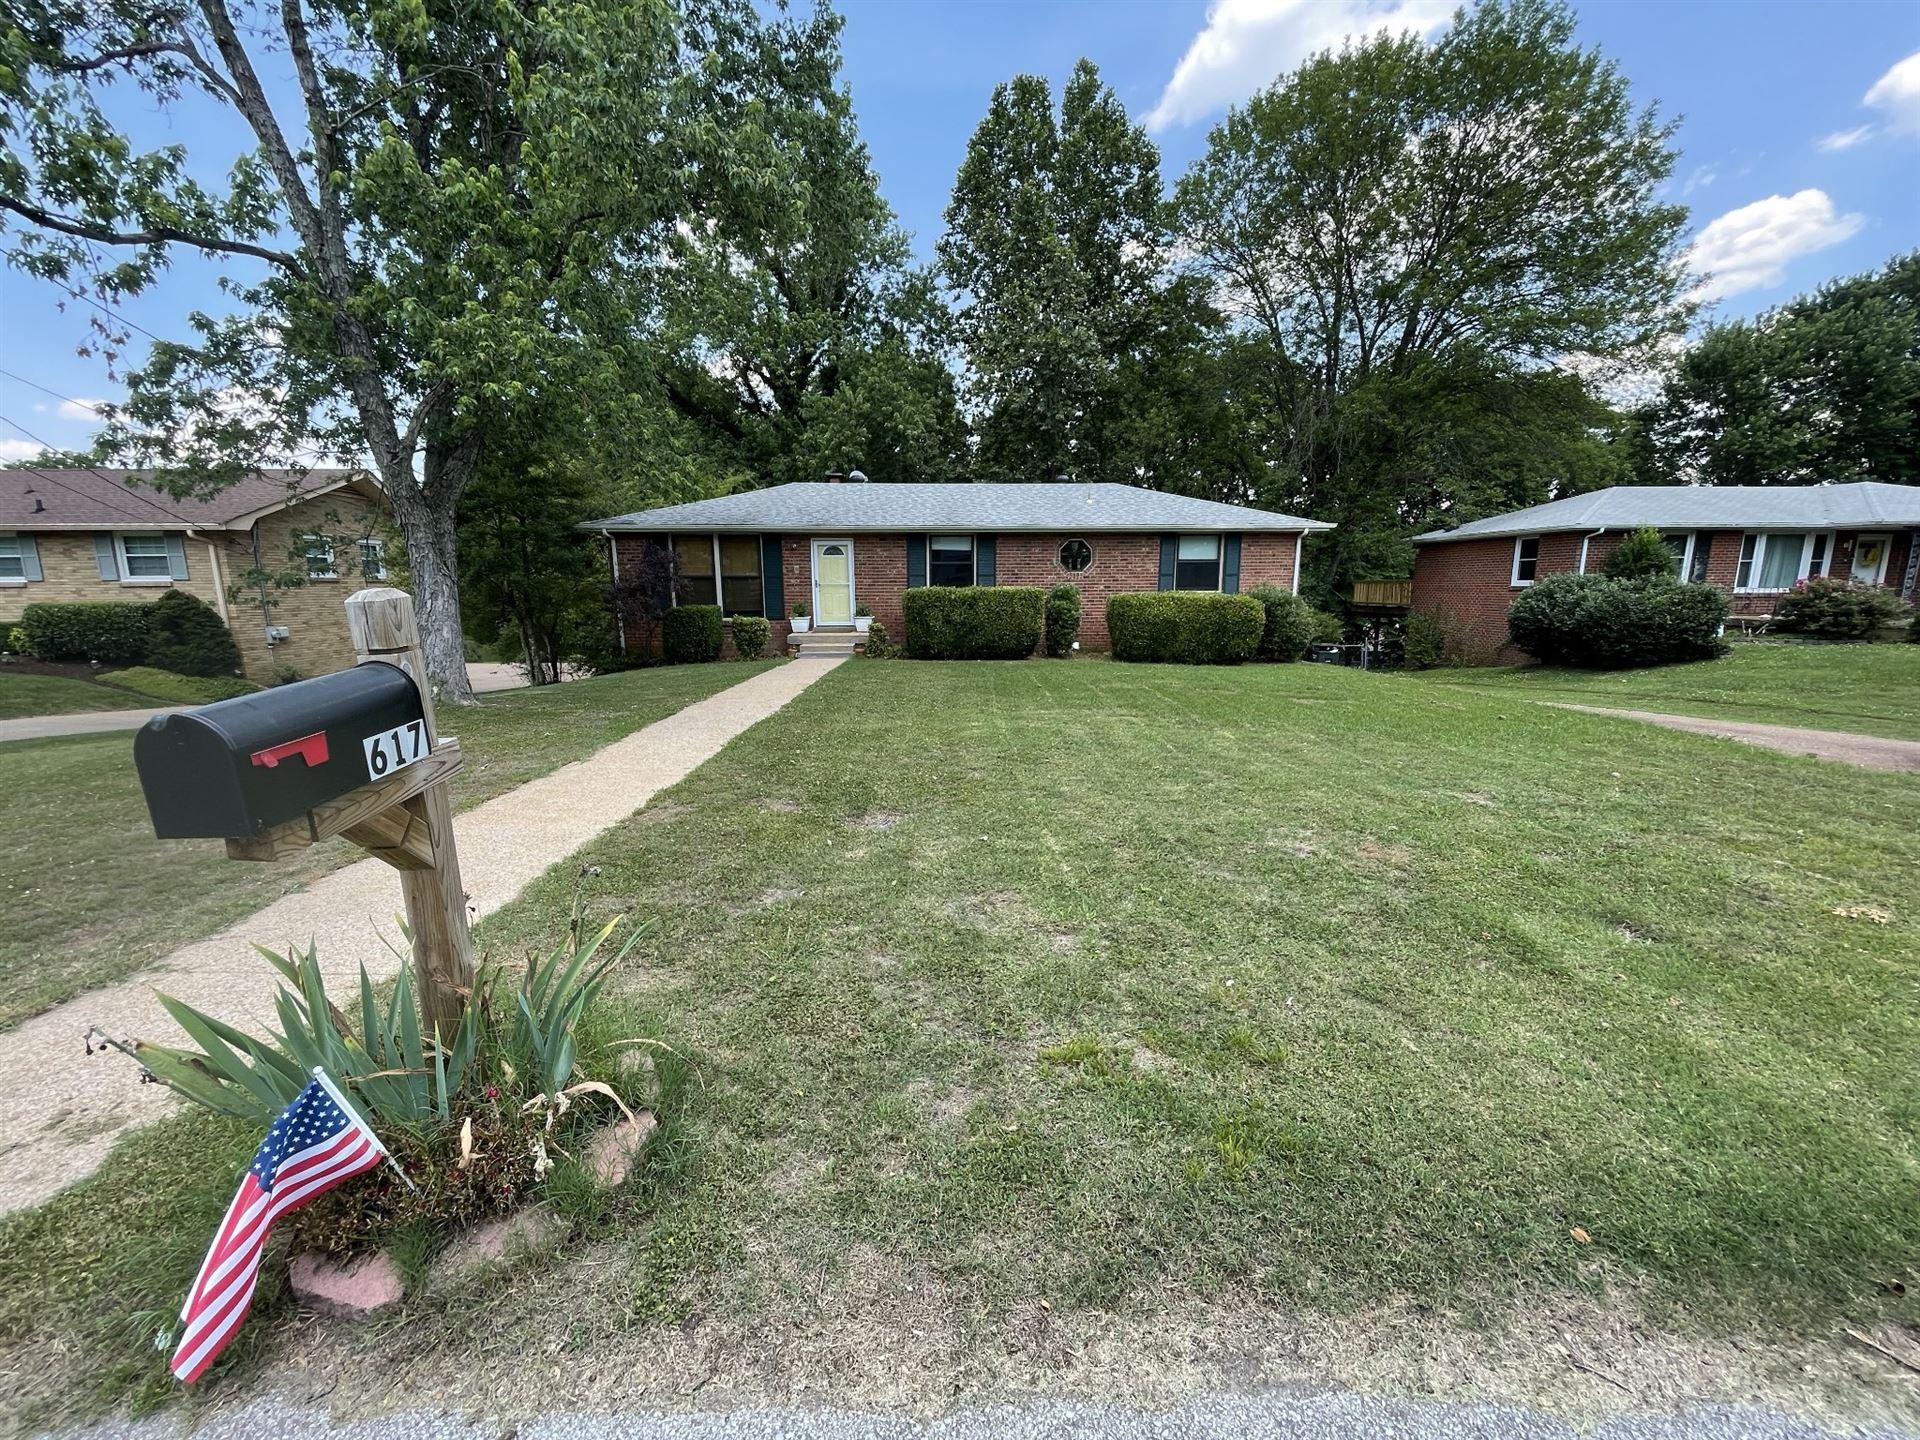 617 Albany Dr, Hermitage, TN 37076 - MLS#: 2264405